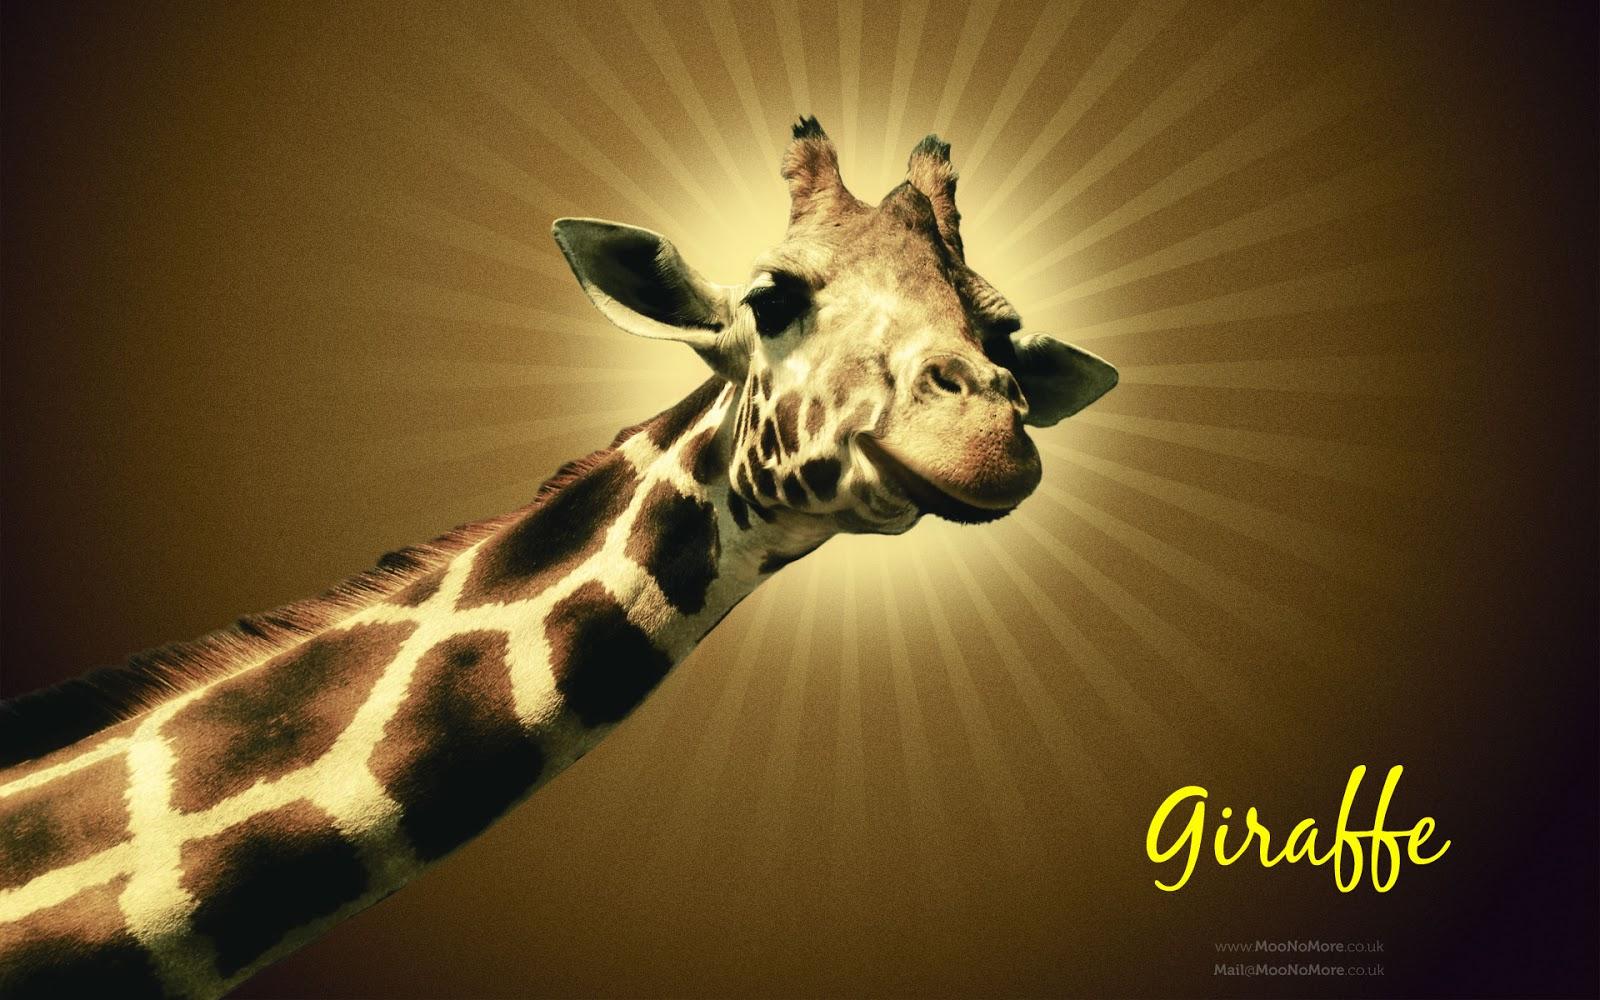 47+ HD Giraffe Wallpaper on WallpaperSafari